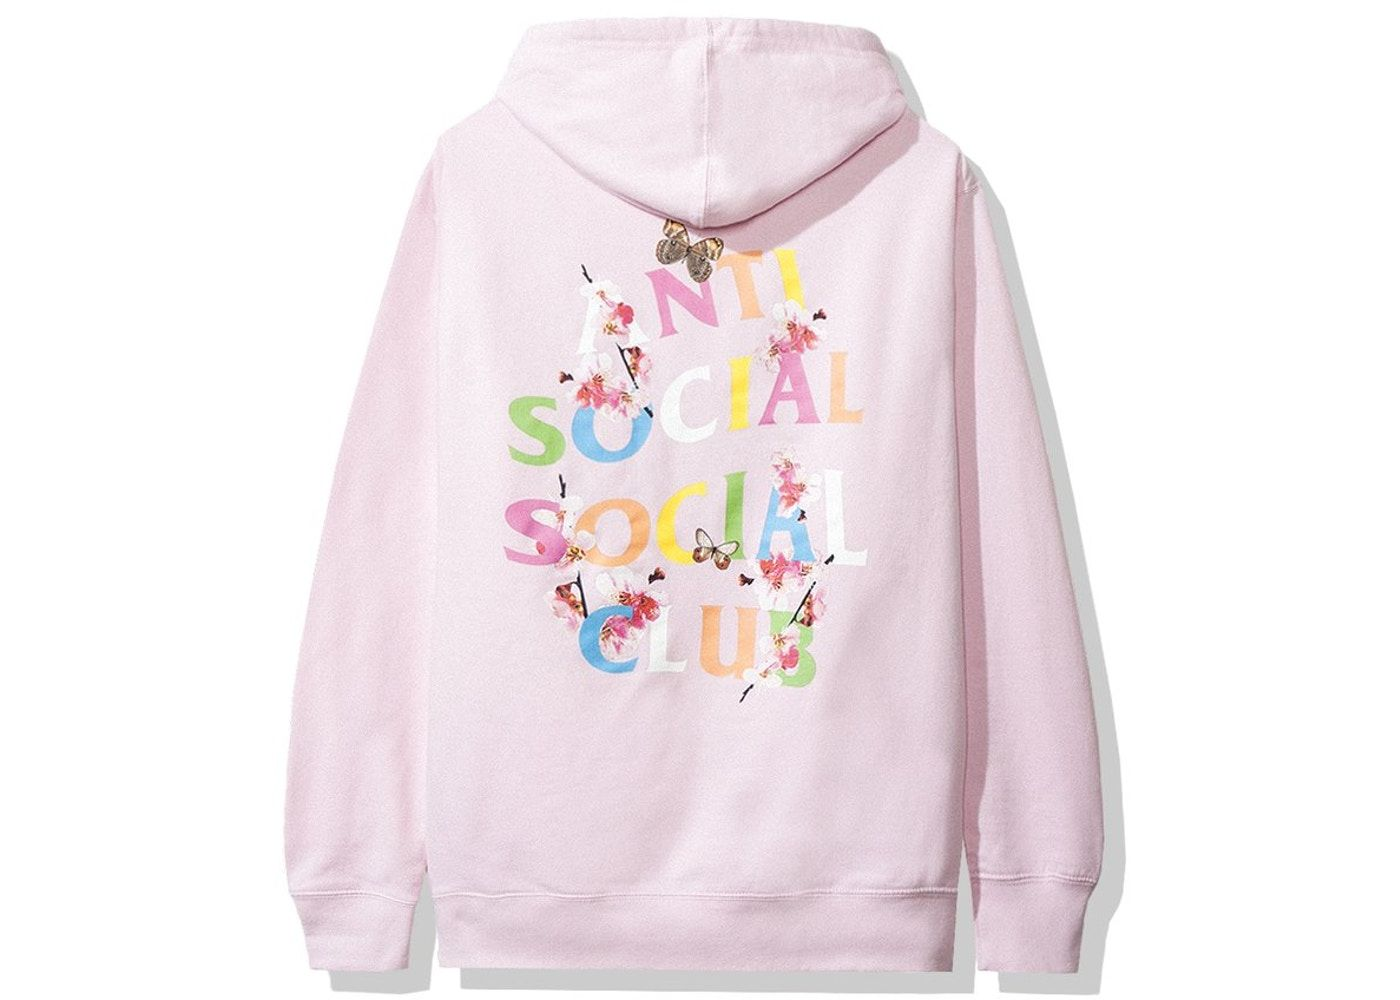 Anti Social Social Club Frantic Hoodie Fw19 Pink In 2021 Stylish Hoodies Hoodies Mom Shirts